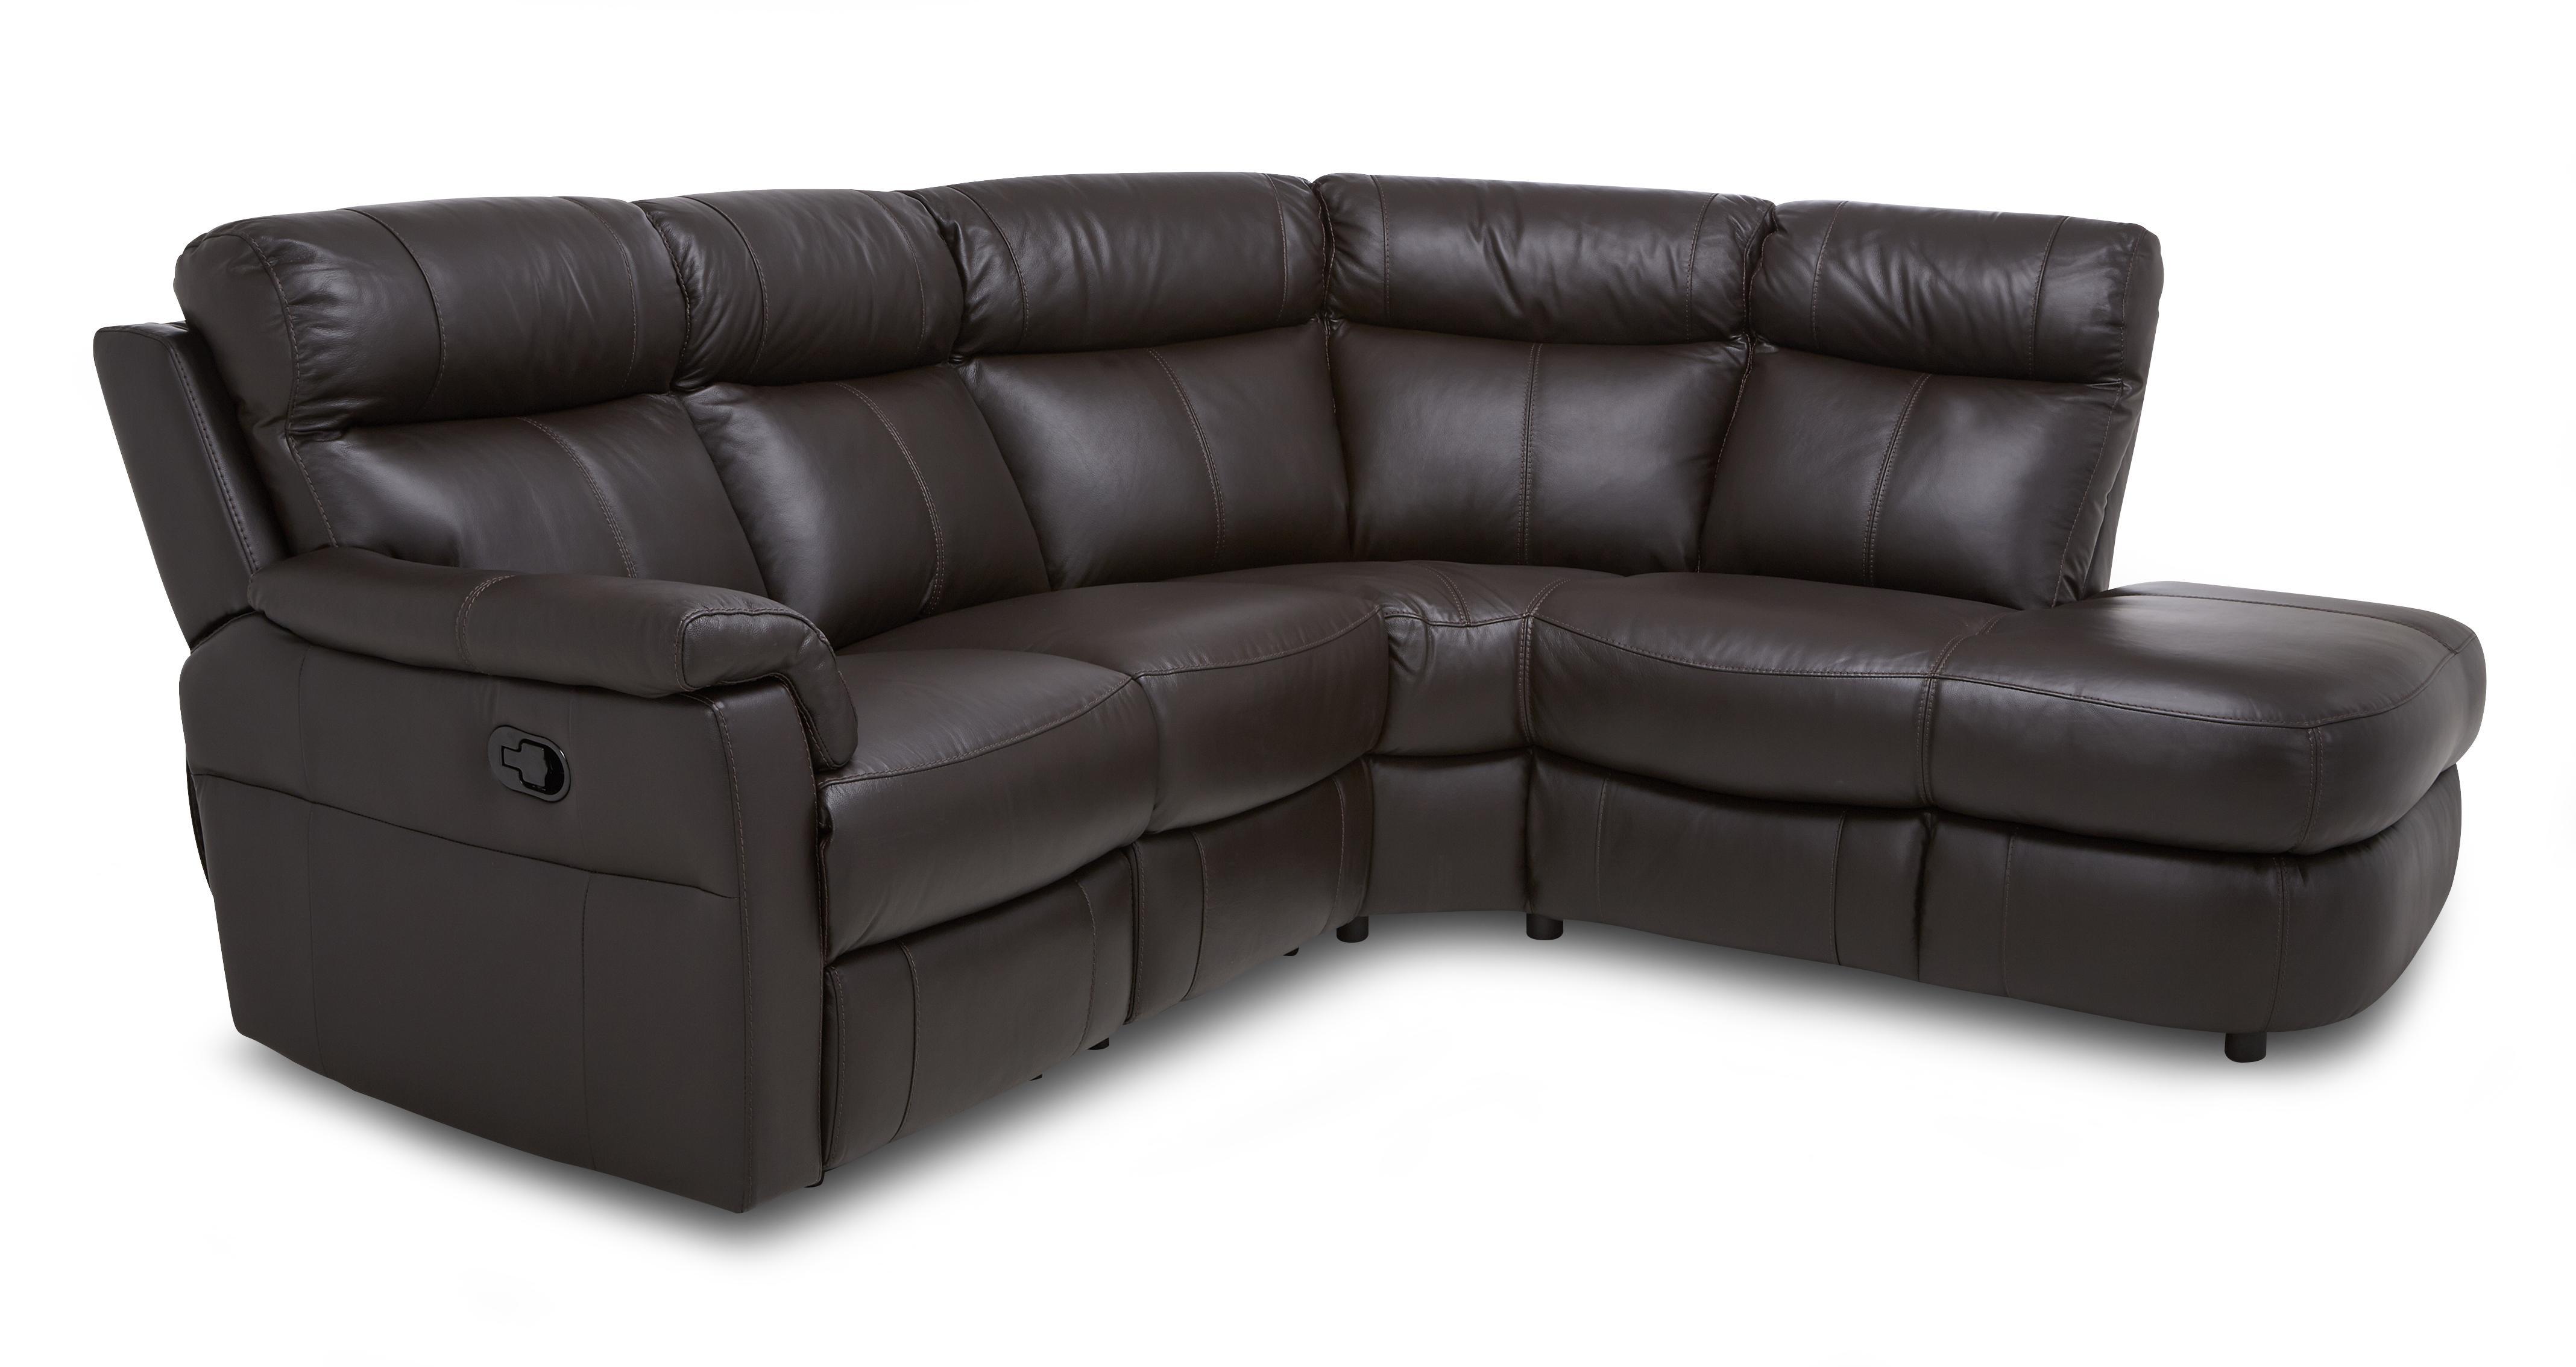 corner sofa bed recliner restoration vintage leather craftsman full grain sectional ellis option b left arm facing 2 piece manual